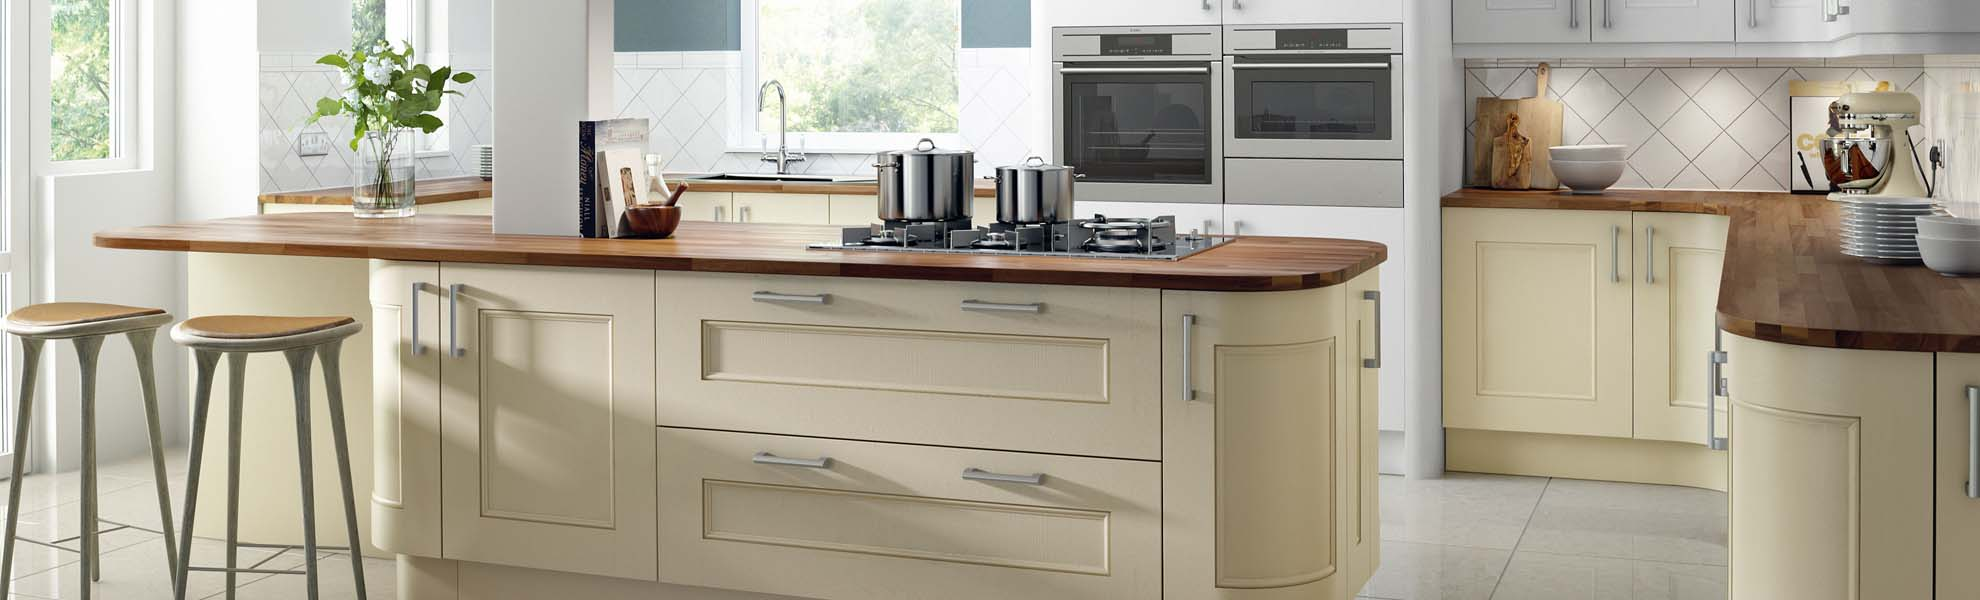 Kitchens Nottingham Derby Ilkeston Cherrywood Interiors